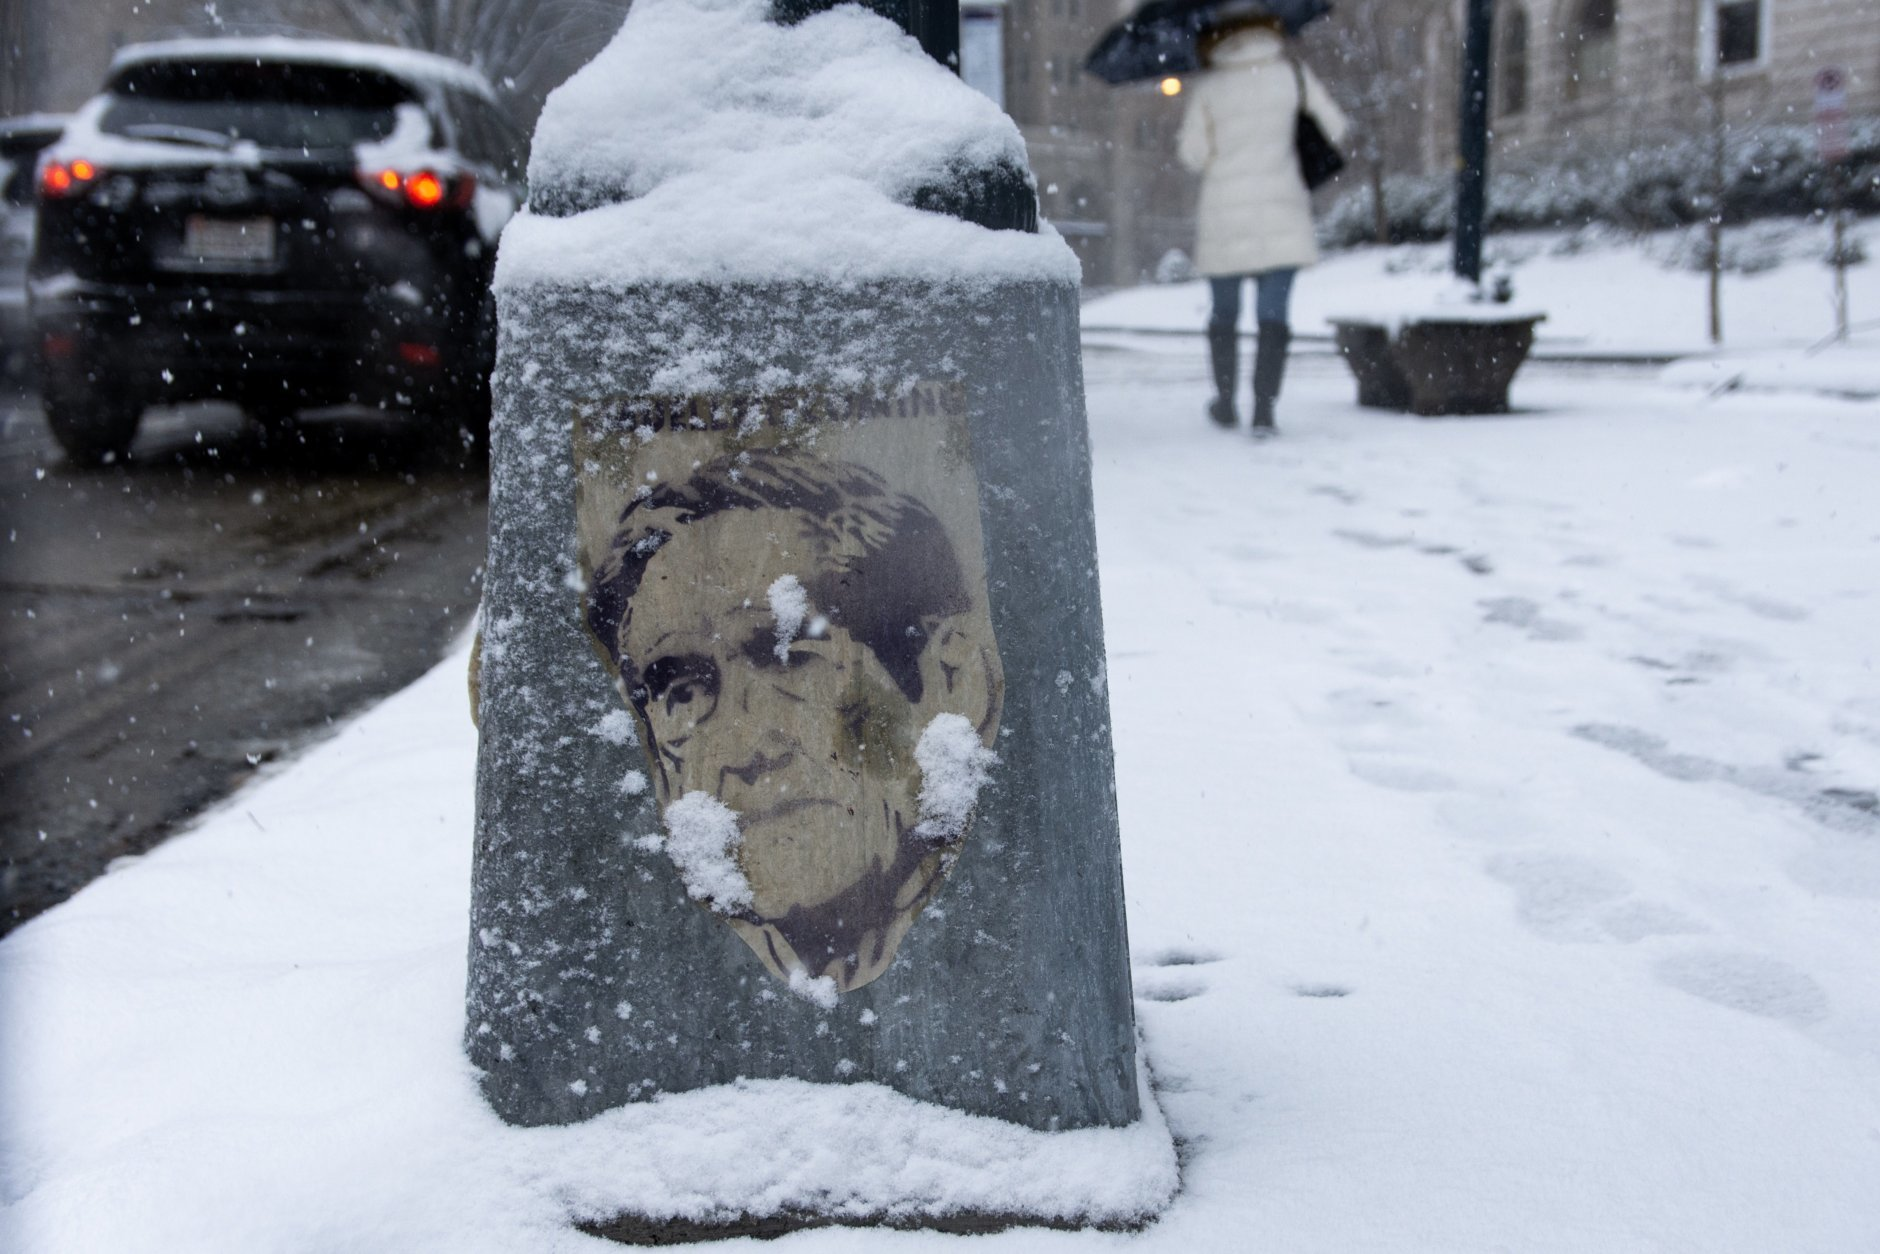 The D.C. region was hammered by snow Wednesday. (WTOP/Alejandro Alvarez)